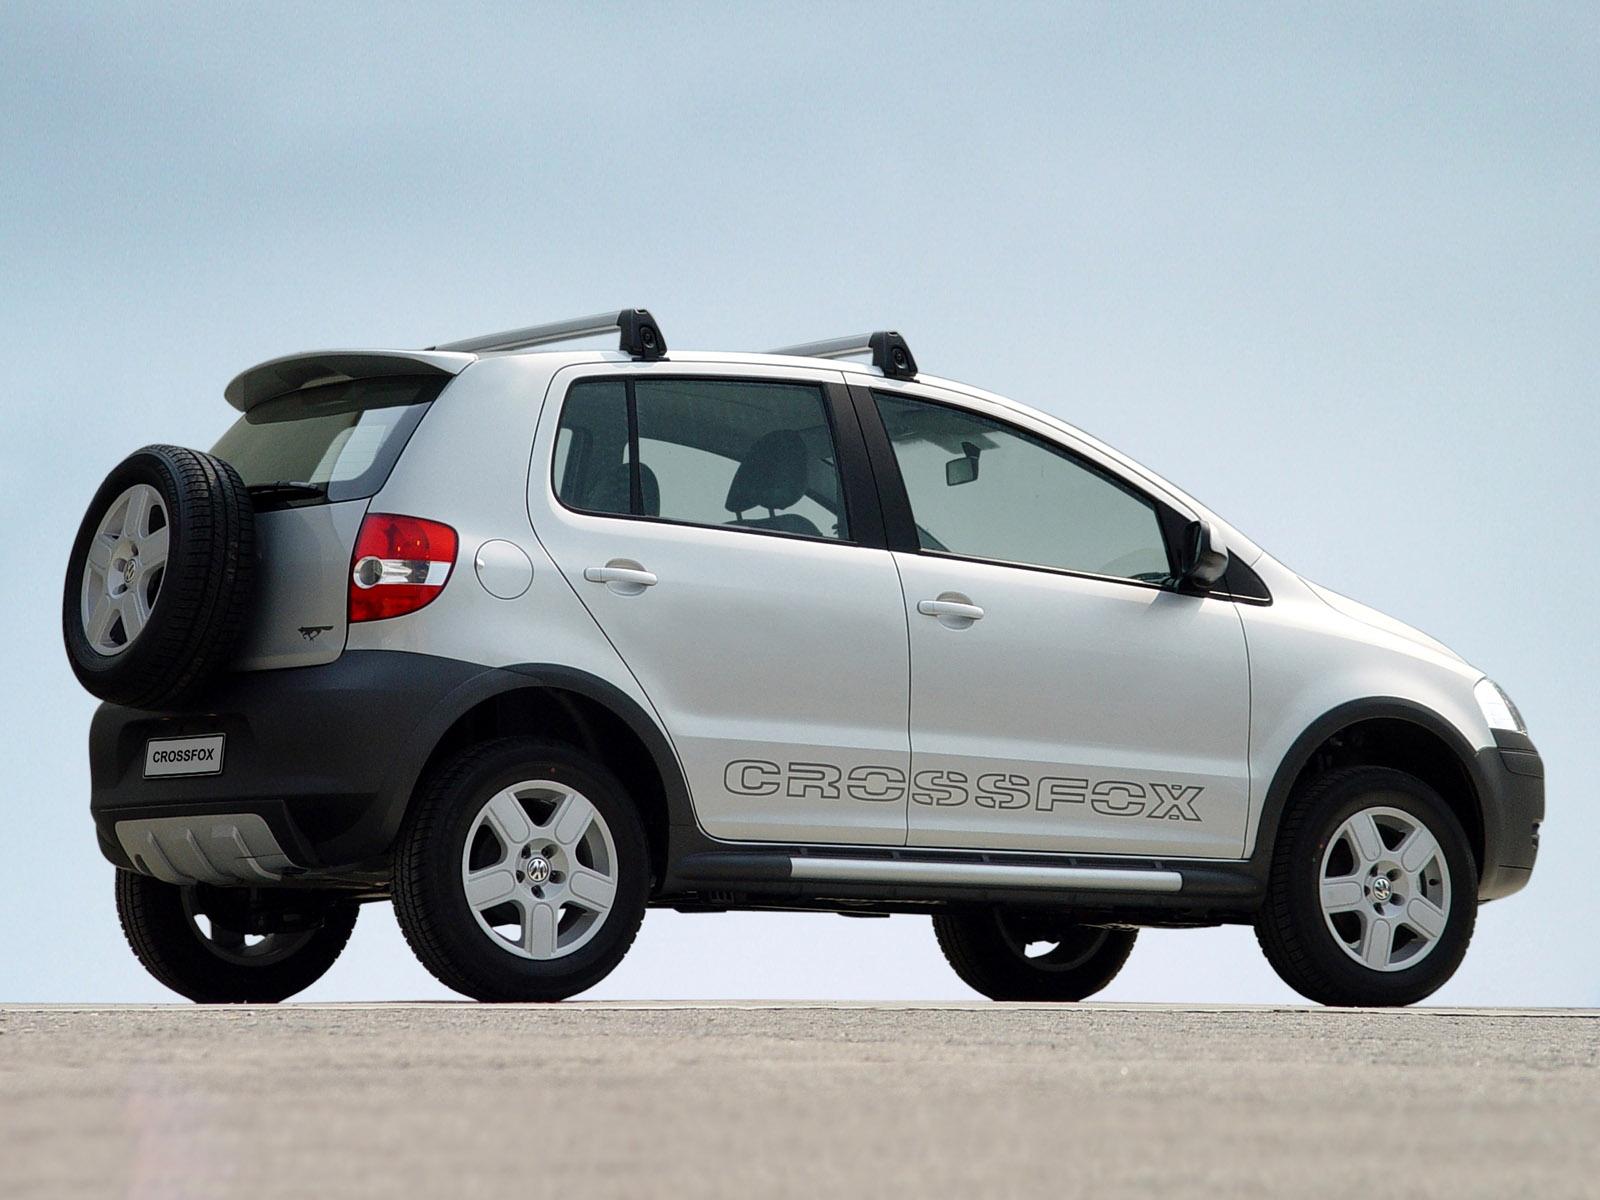 Volkswagen CrossFox photos - PhotoGallery with 6 pics ...